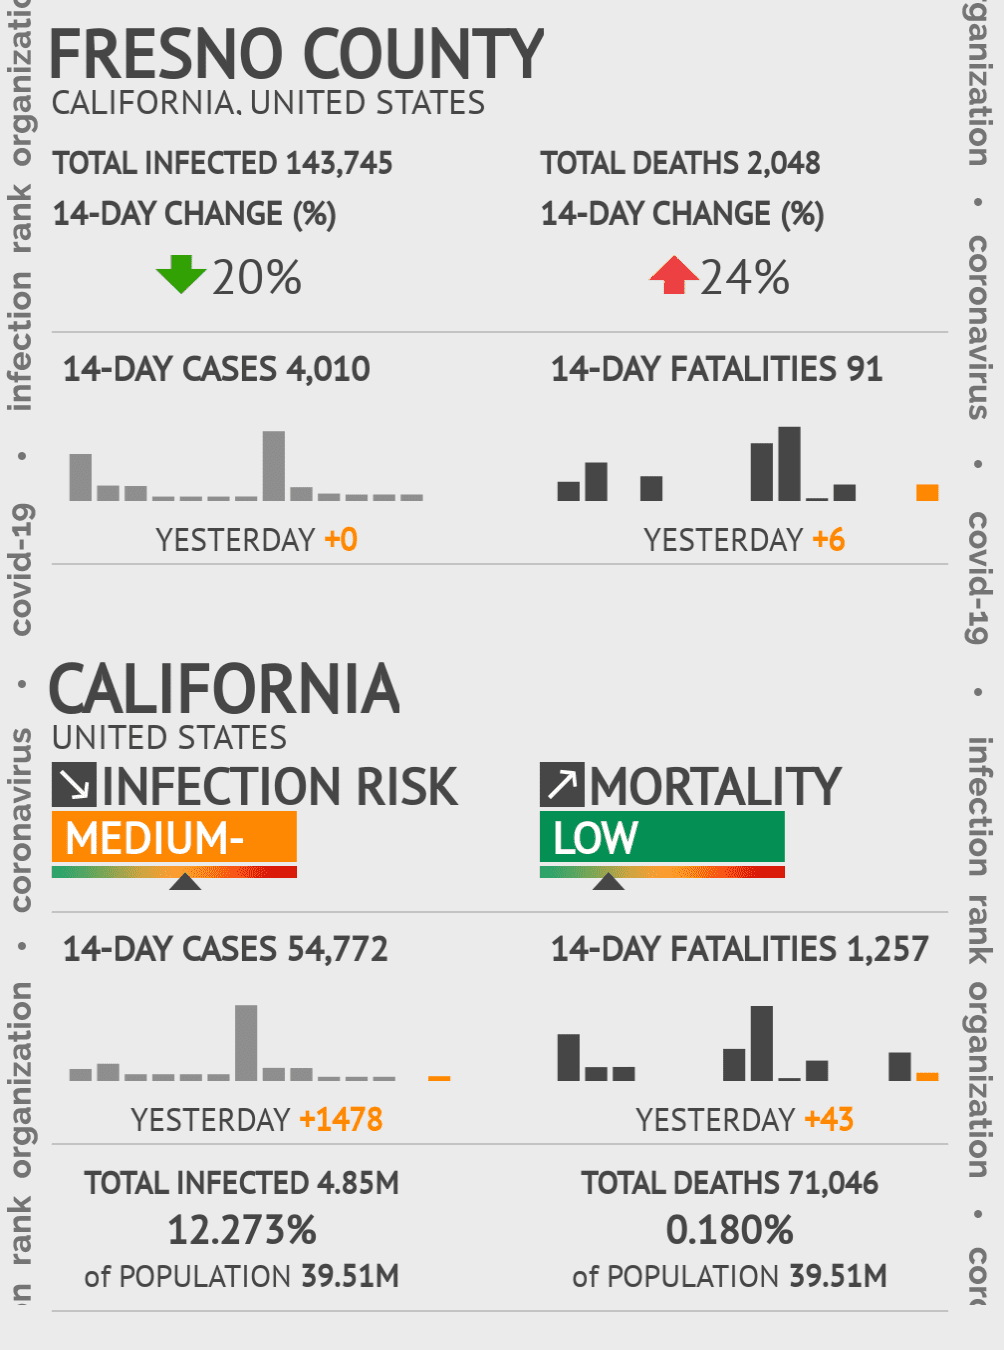 Fresno County Coronavirus Covid-19 Risk of Infection on October 27, 2020